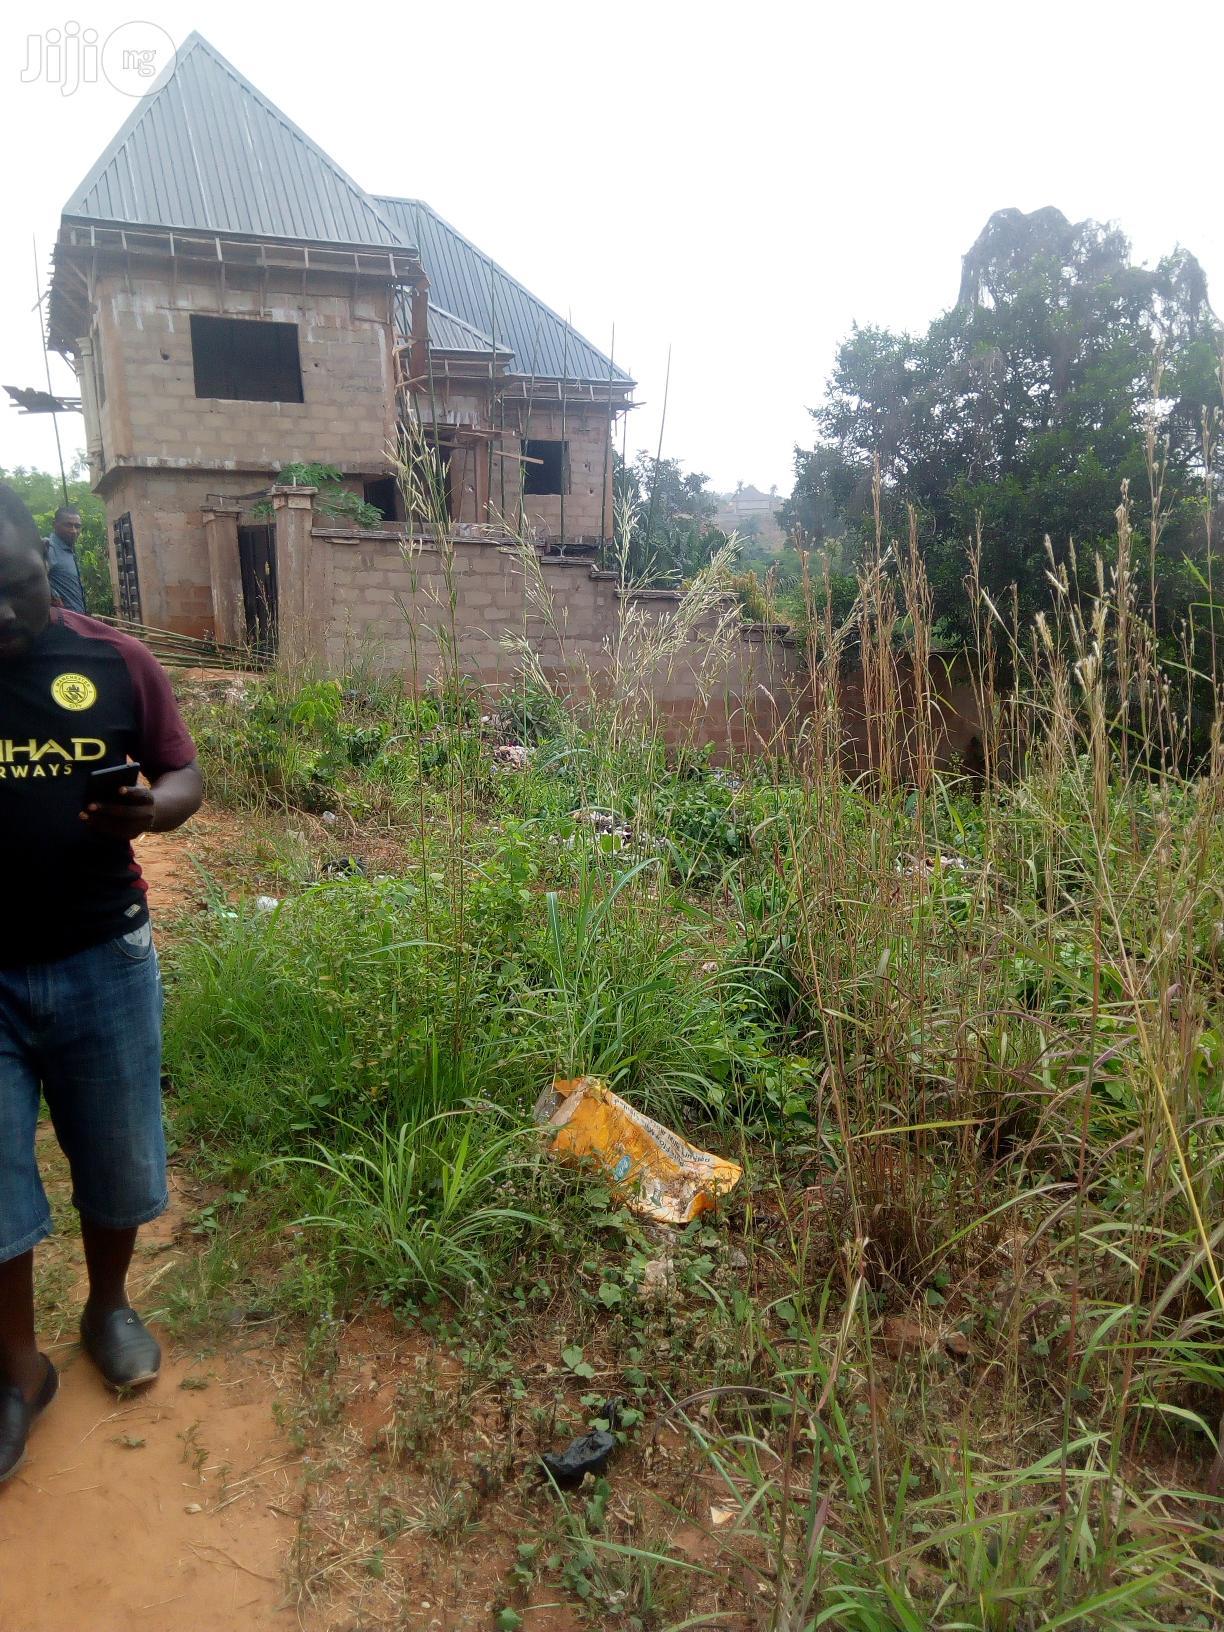 1 and Half Plots for Sale at Aguonye Awka | Land & Plots For Sale for sale in Awka, Anambra State, Nigeria